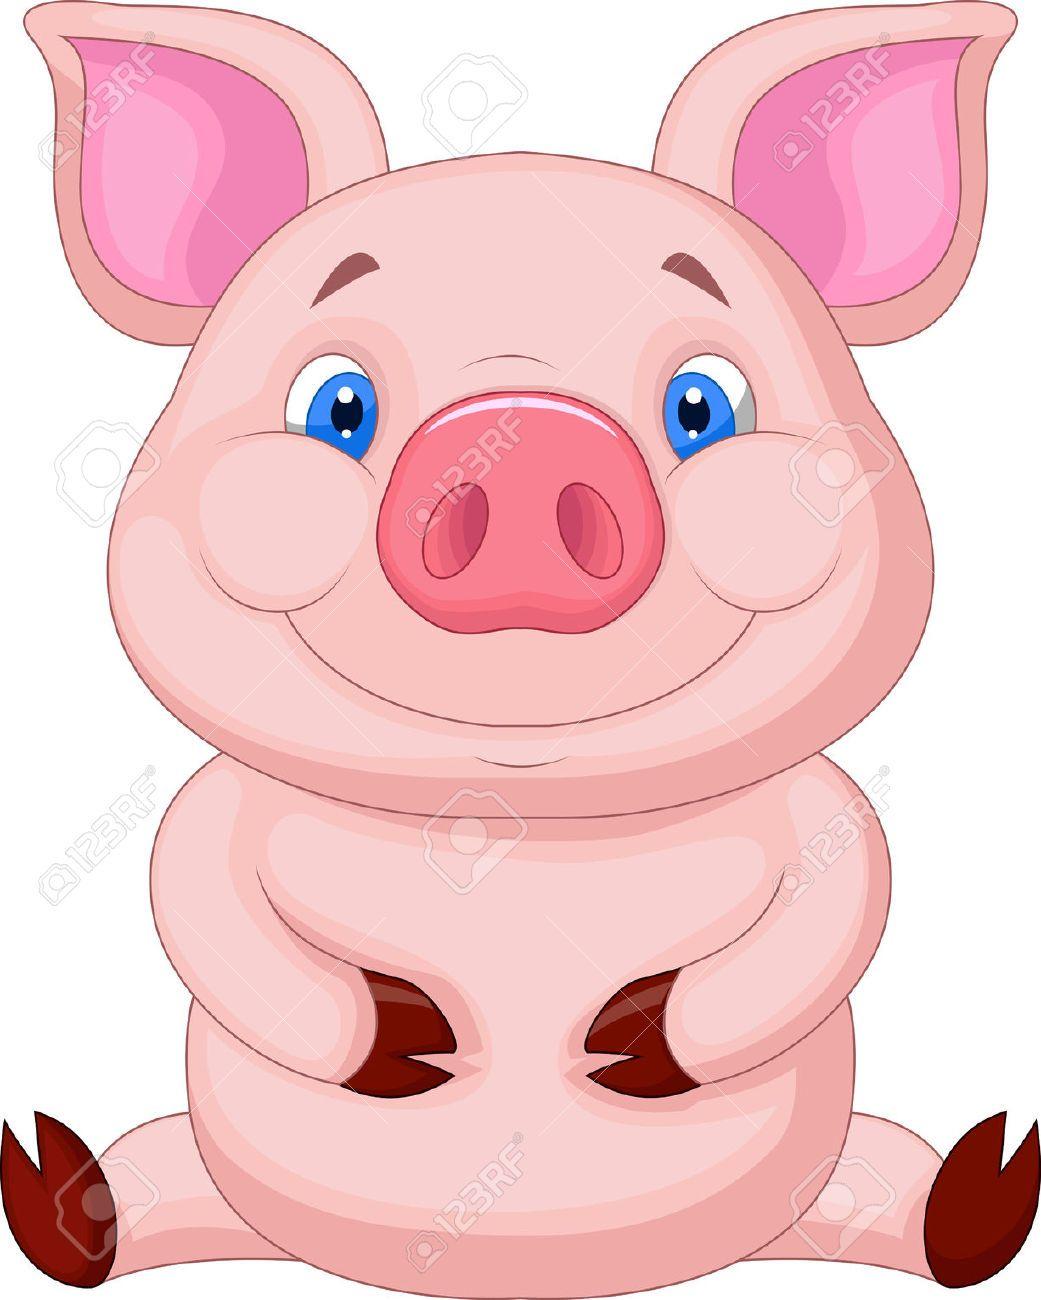 Cute Baby Pig Cartoon Sitting Royalty Free Cliparts Vectors And Stock Illustration Image 23007404 Pig Cartoon Baby Pigs Cute Baby Pigs